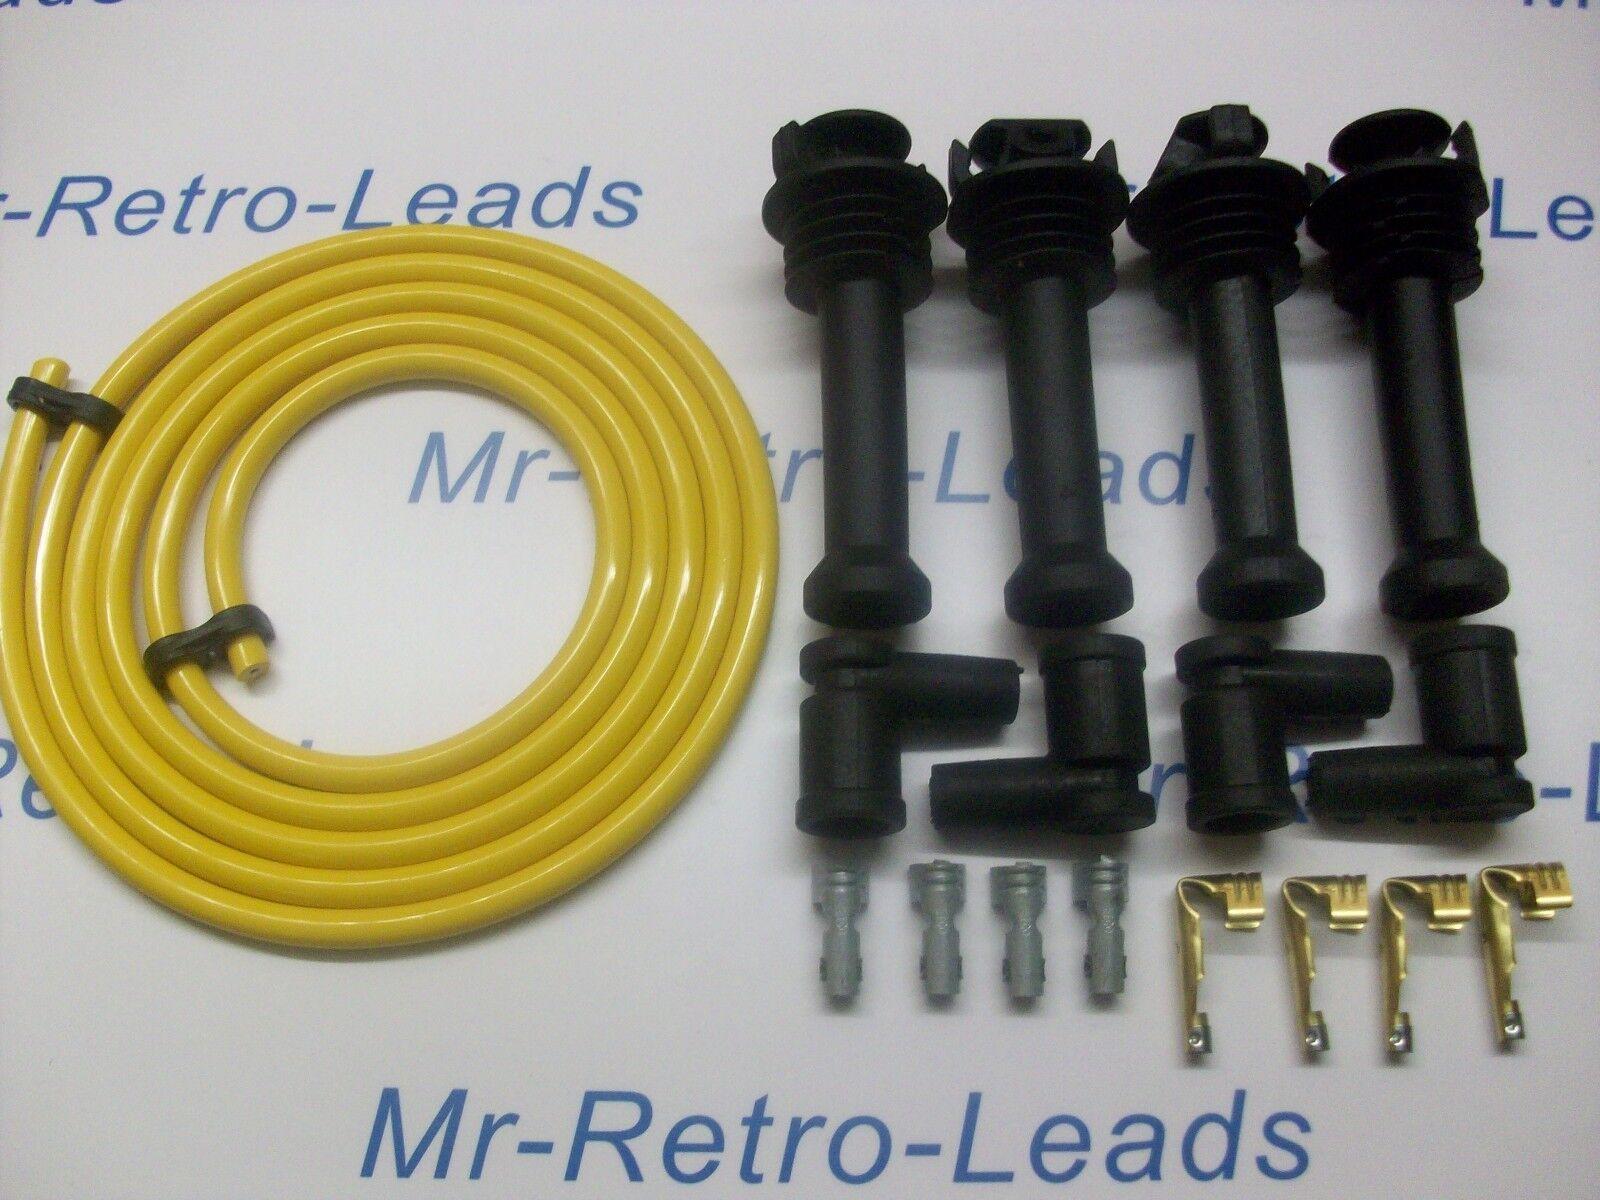 Ht allumage conduit /& ngk spark plug set Mazda MX5 Mk2 1.8 1998-2000